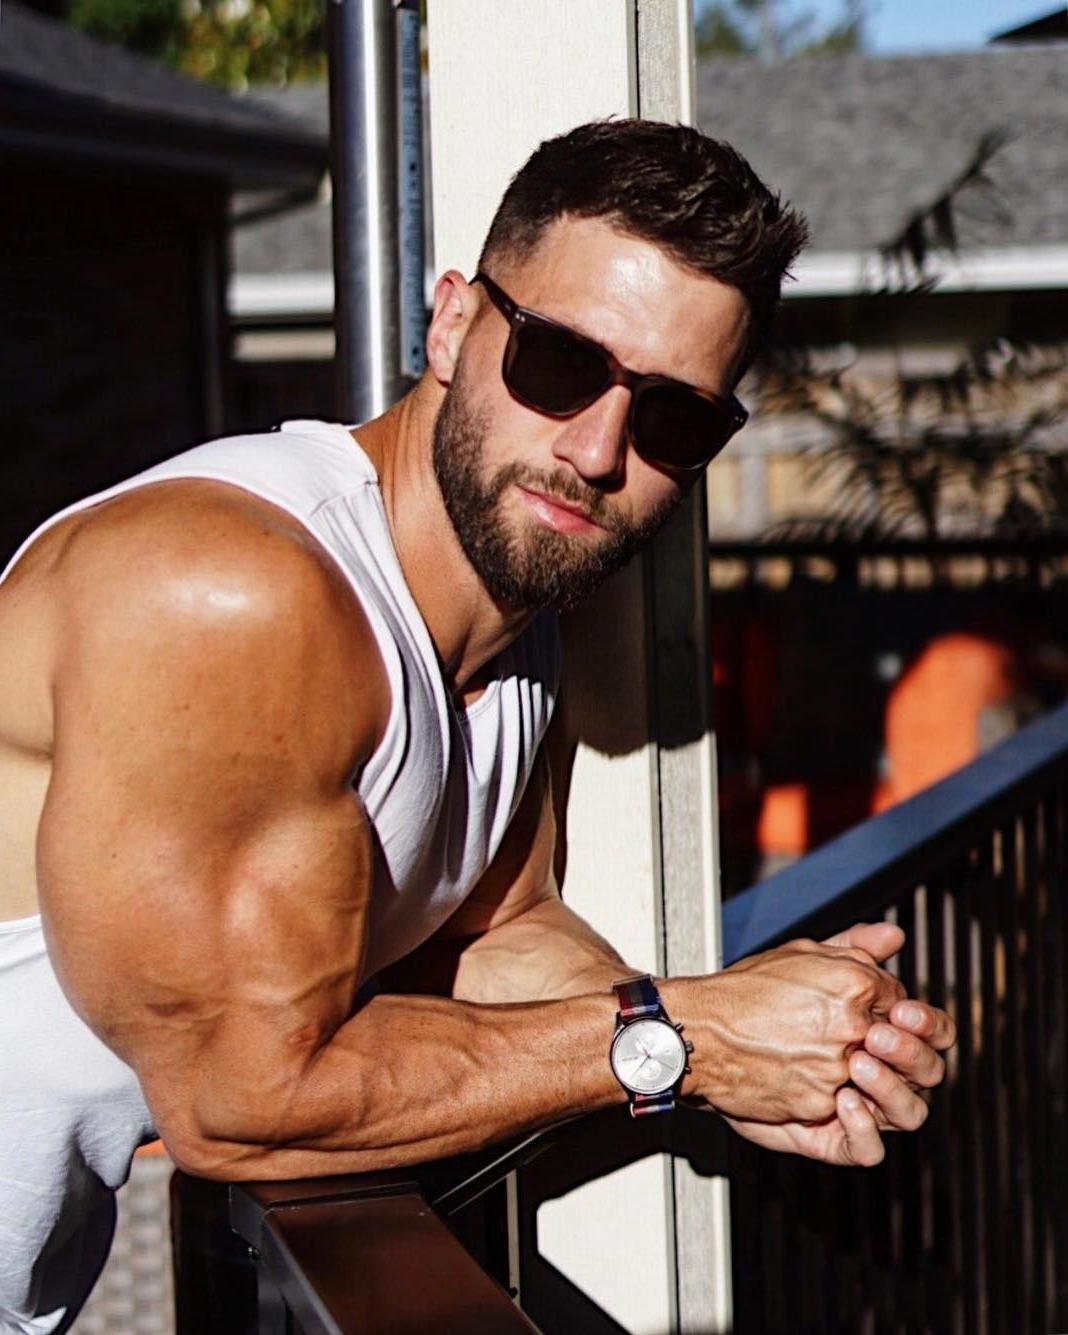 bearded-guys-sunglasses-huge-swole-biceps